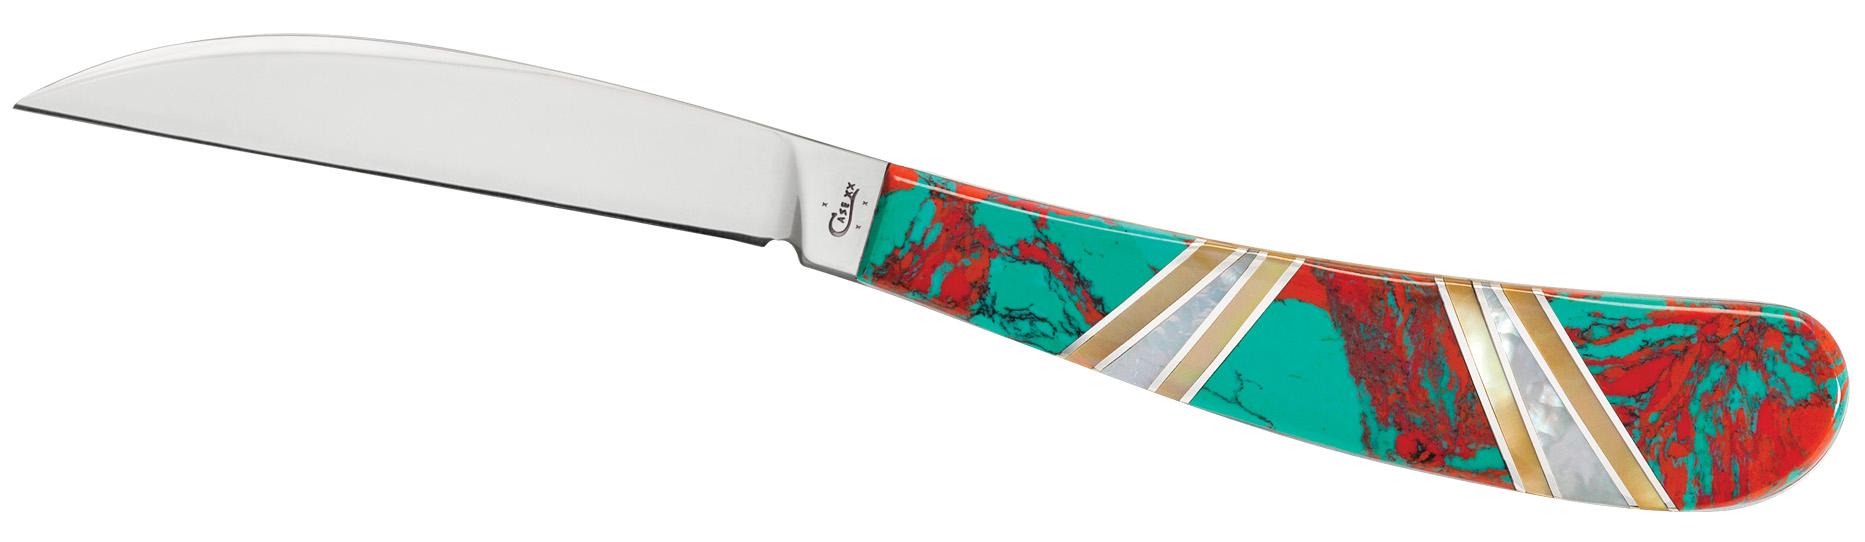 CASE XX KNIFE 11145 EXOTIC SONORA SUNSET DESK KNIFE